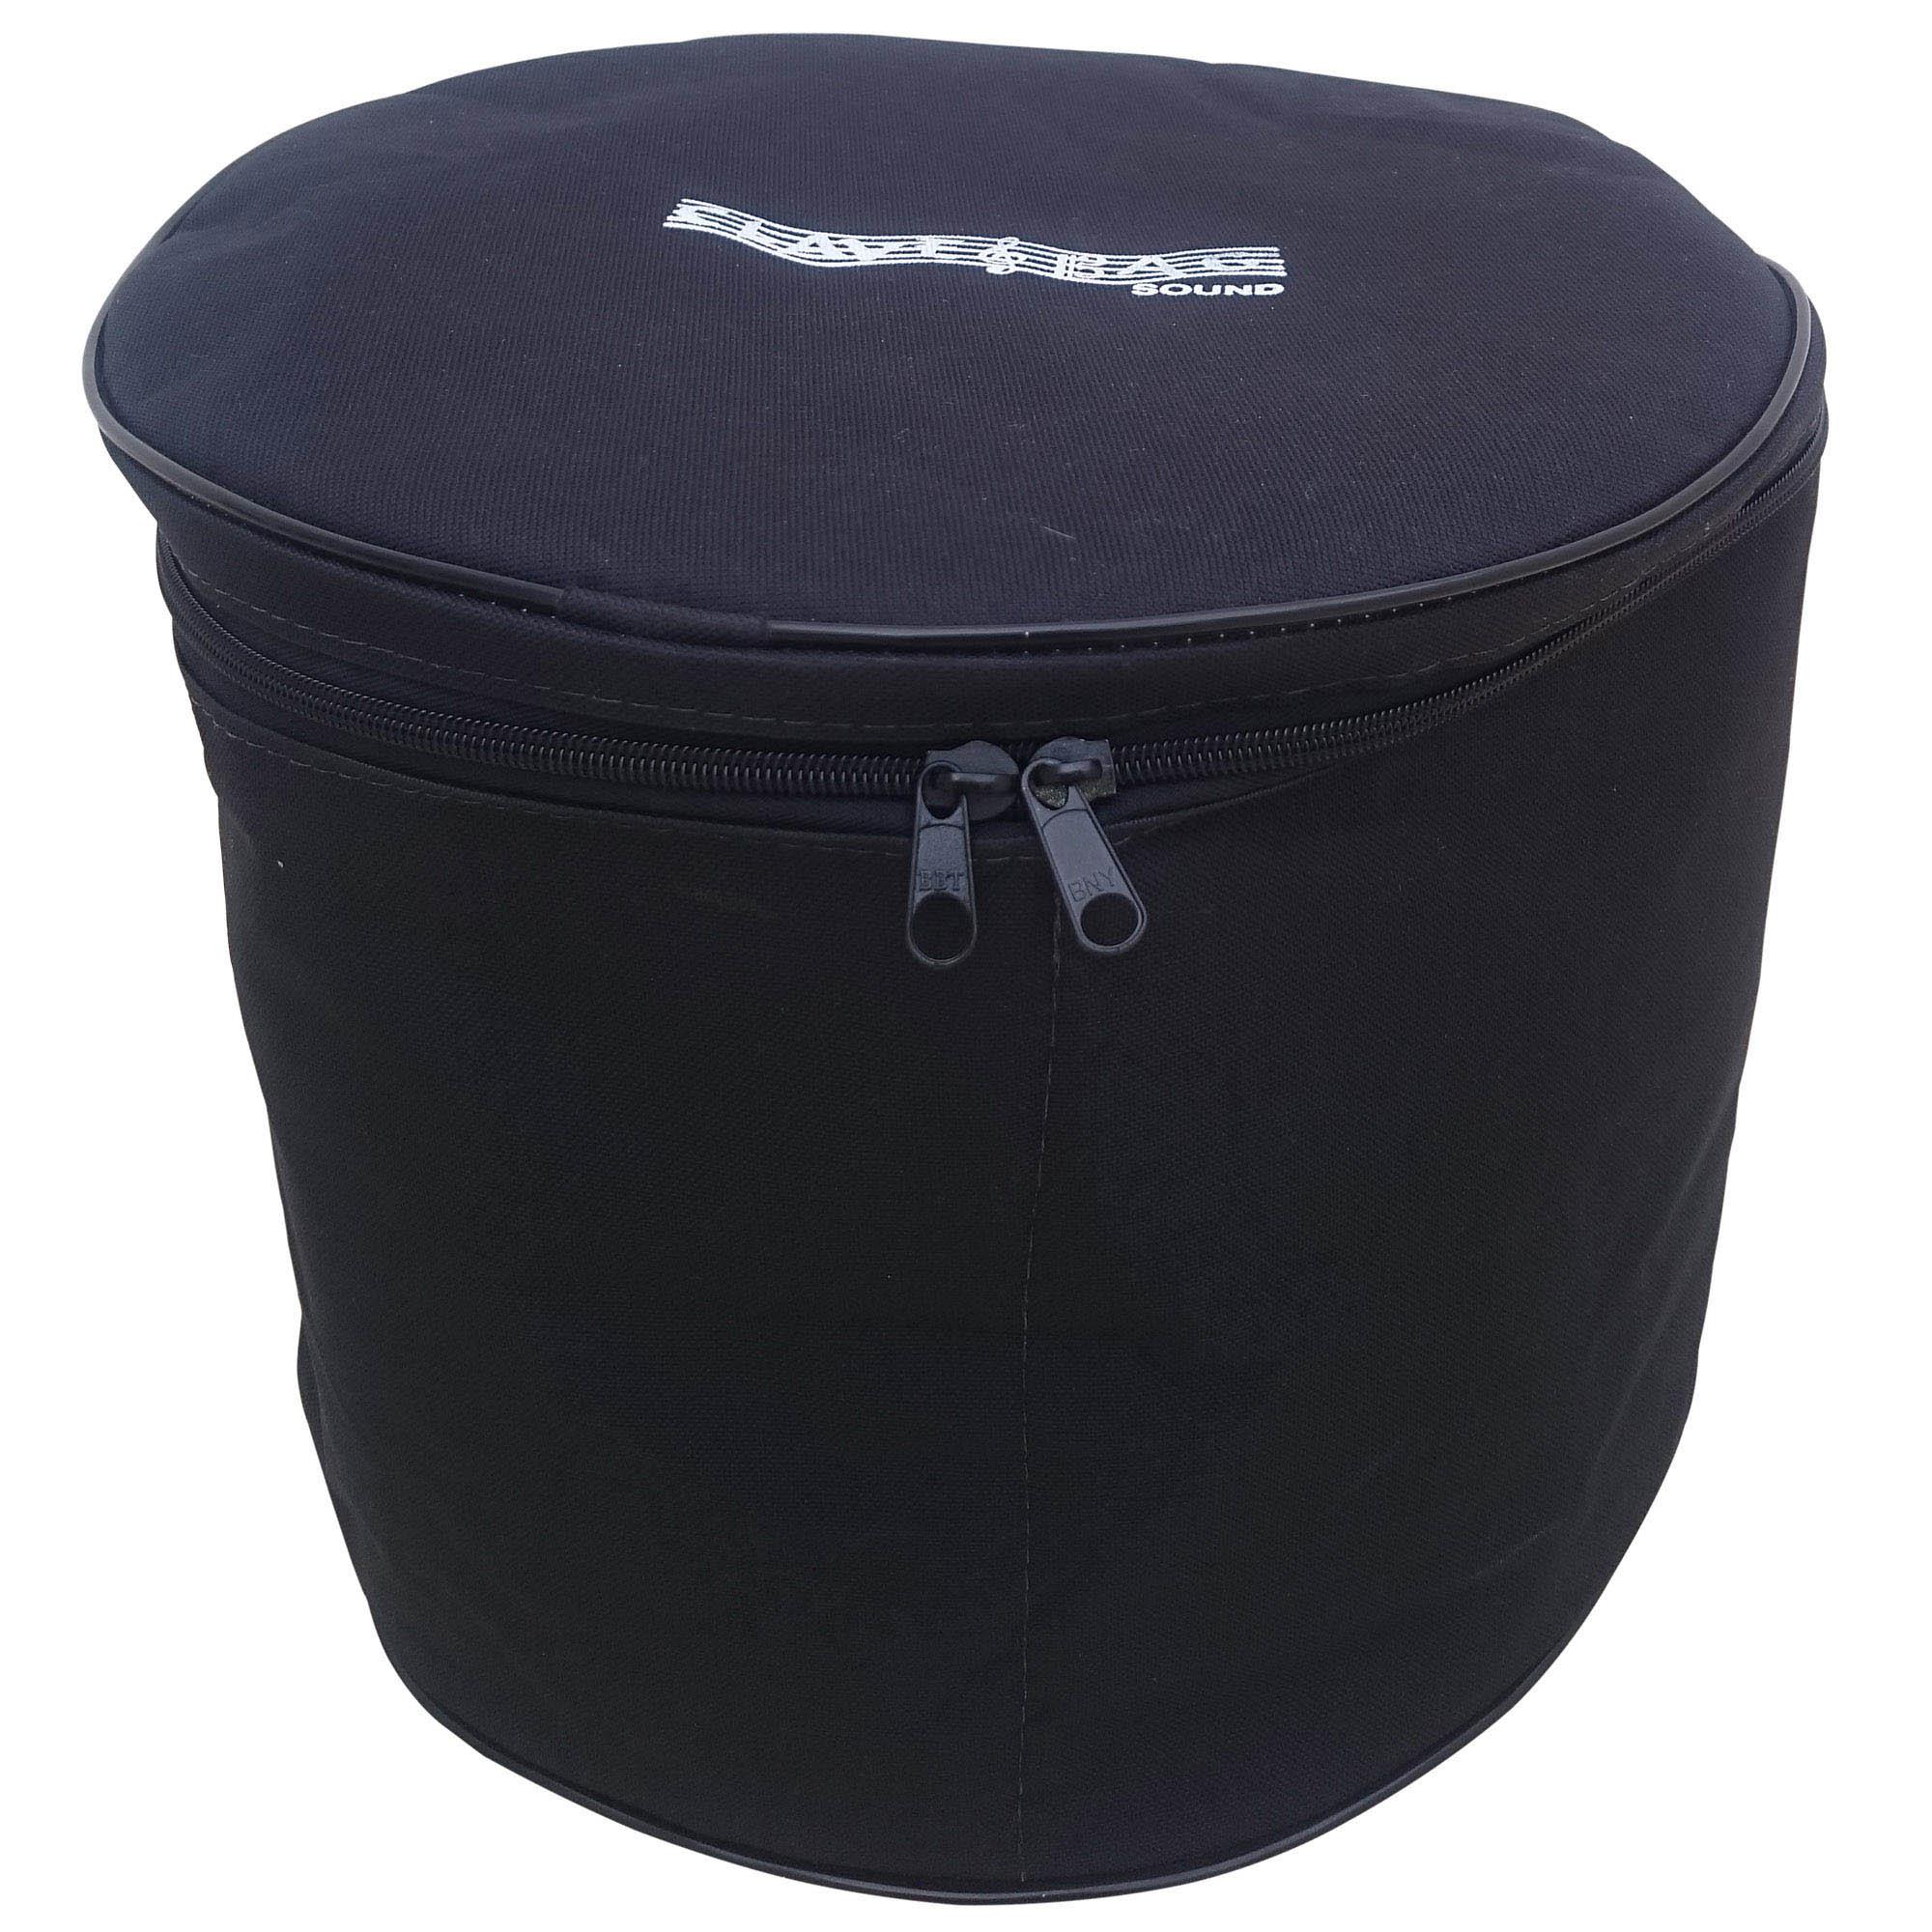 "Capa Bag Extra Luxo para Surdo Pagode 16"" x 66 cm CLAVE & BAG. Totalmente acolchoado"